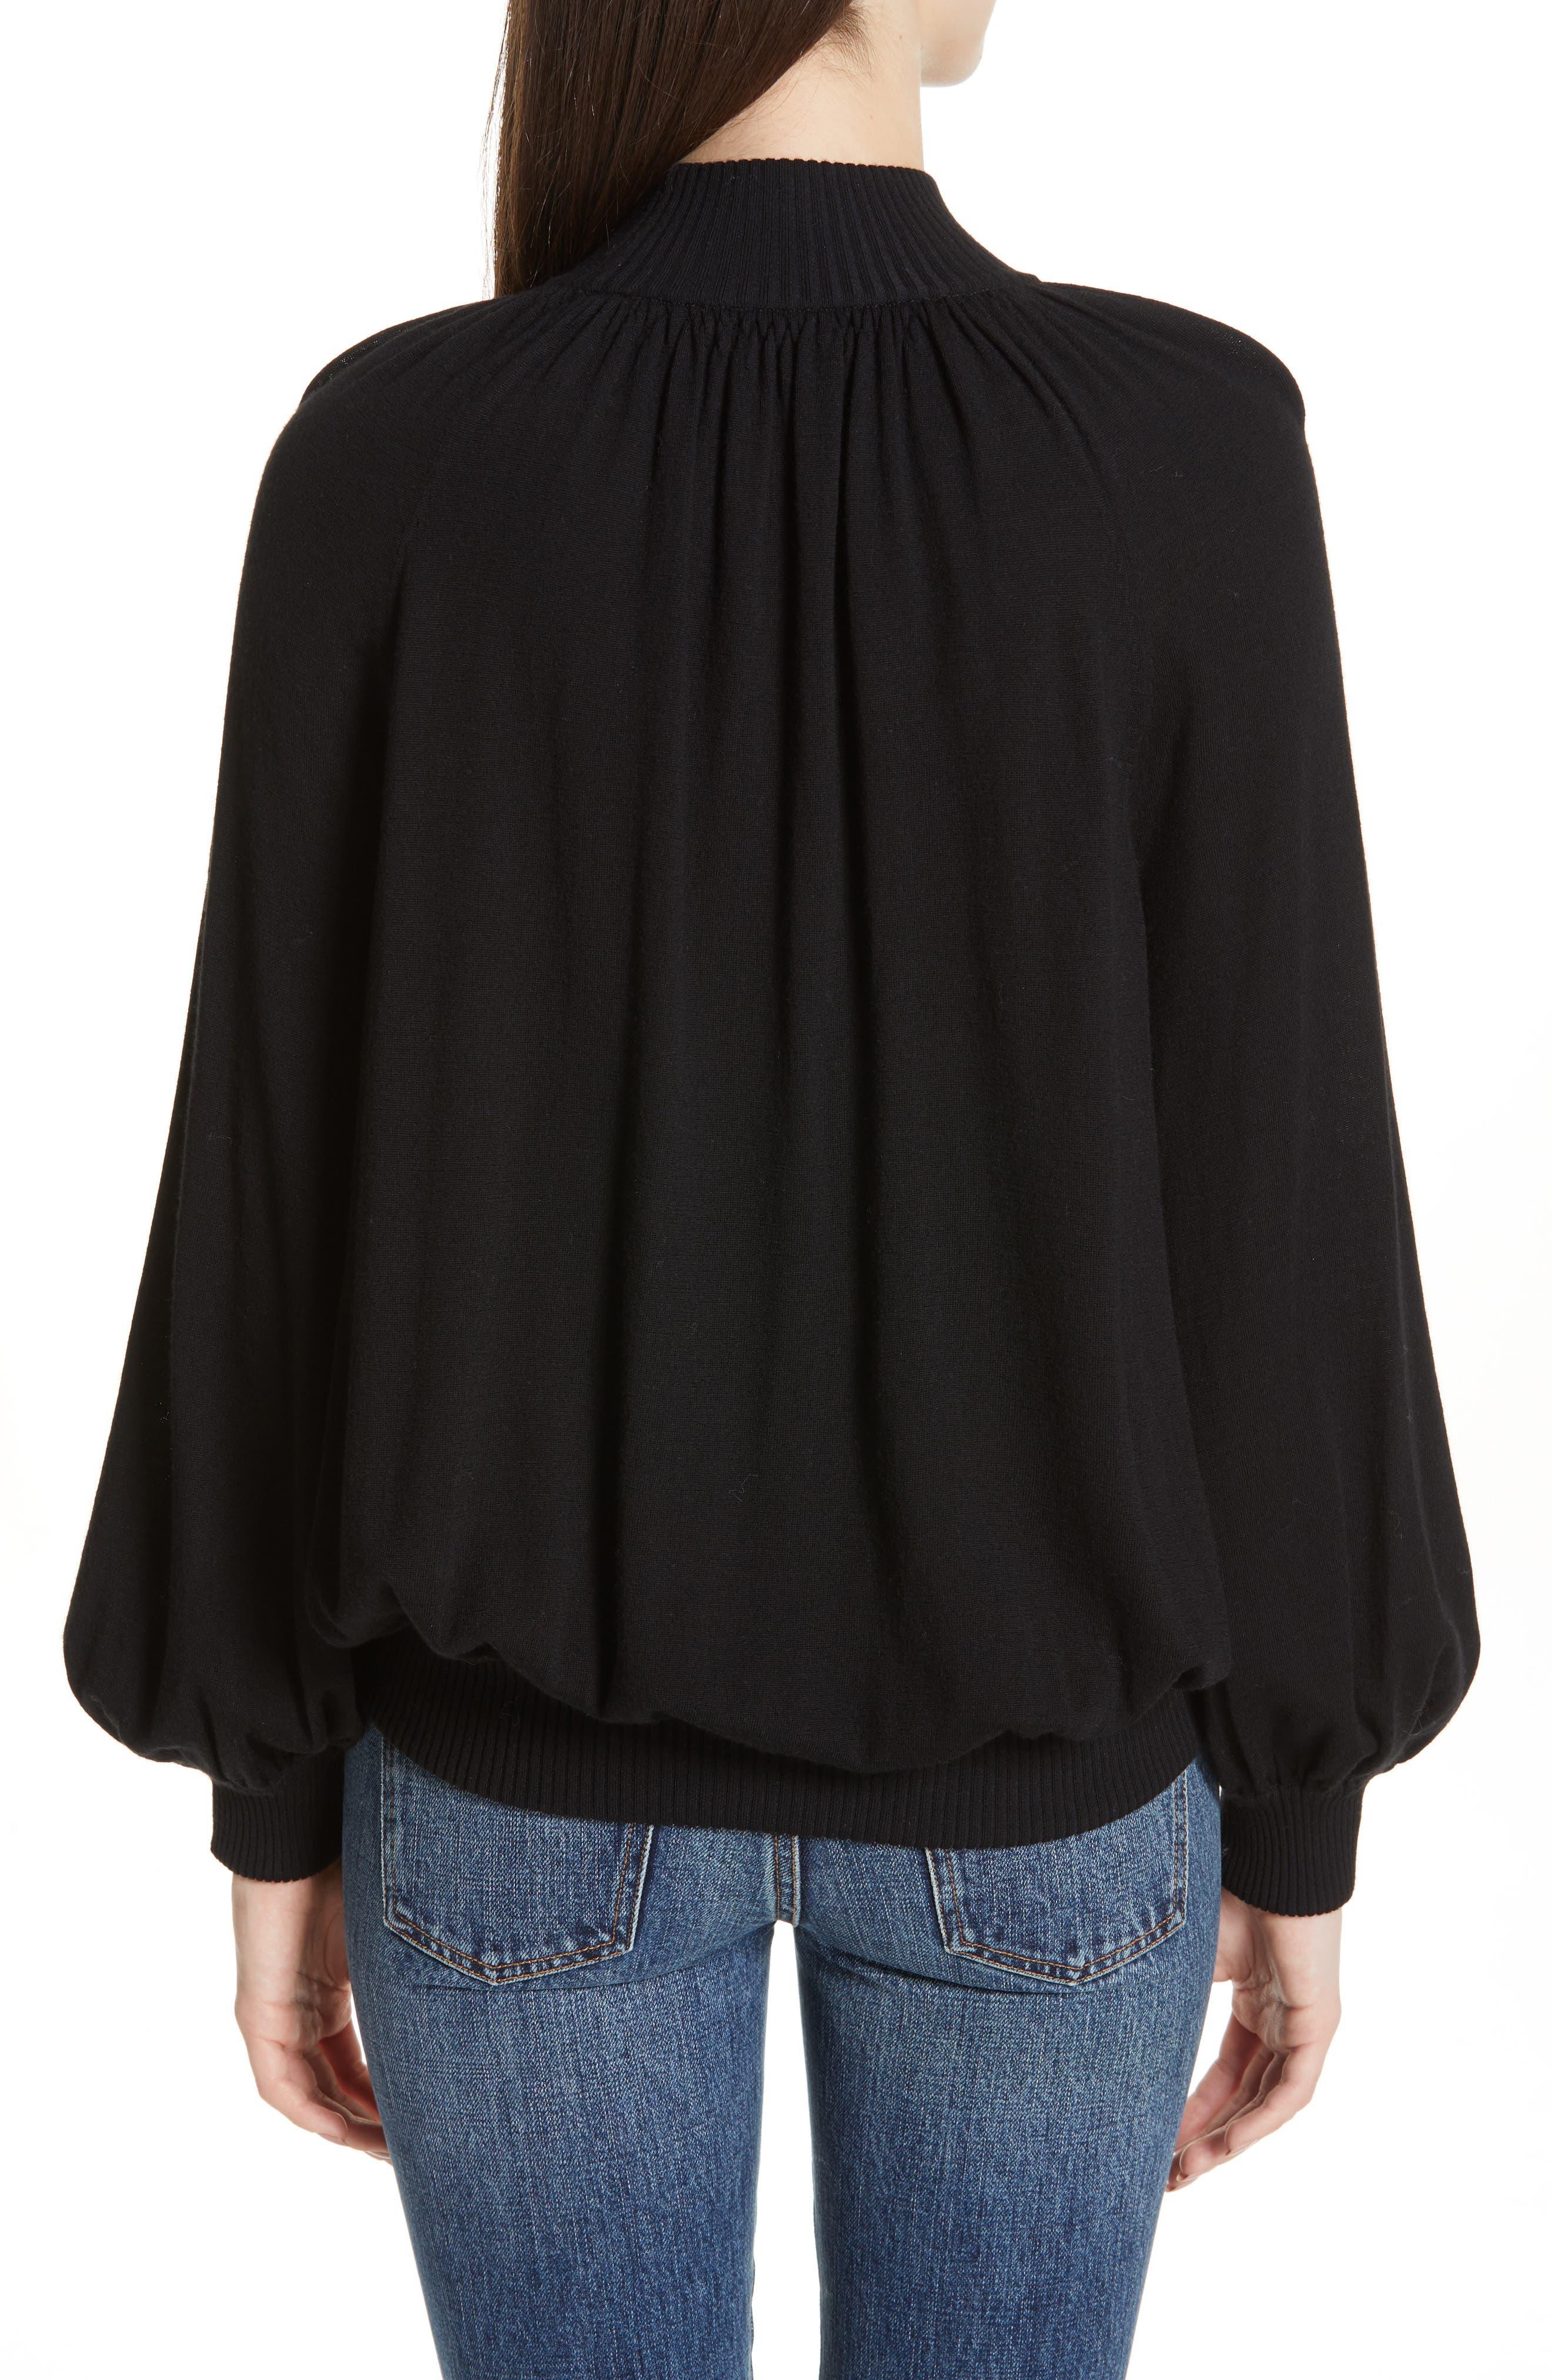 CO, Cashmere High Neck Blouson Sweater, Alternate thumbnail 2, color, BLACK